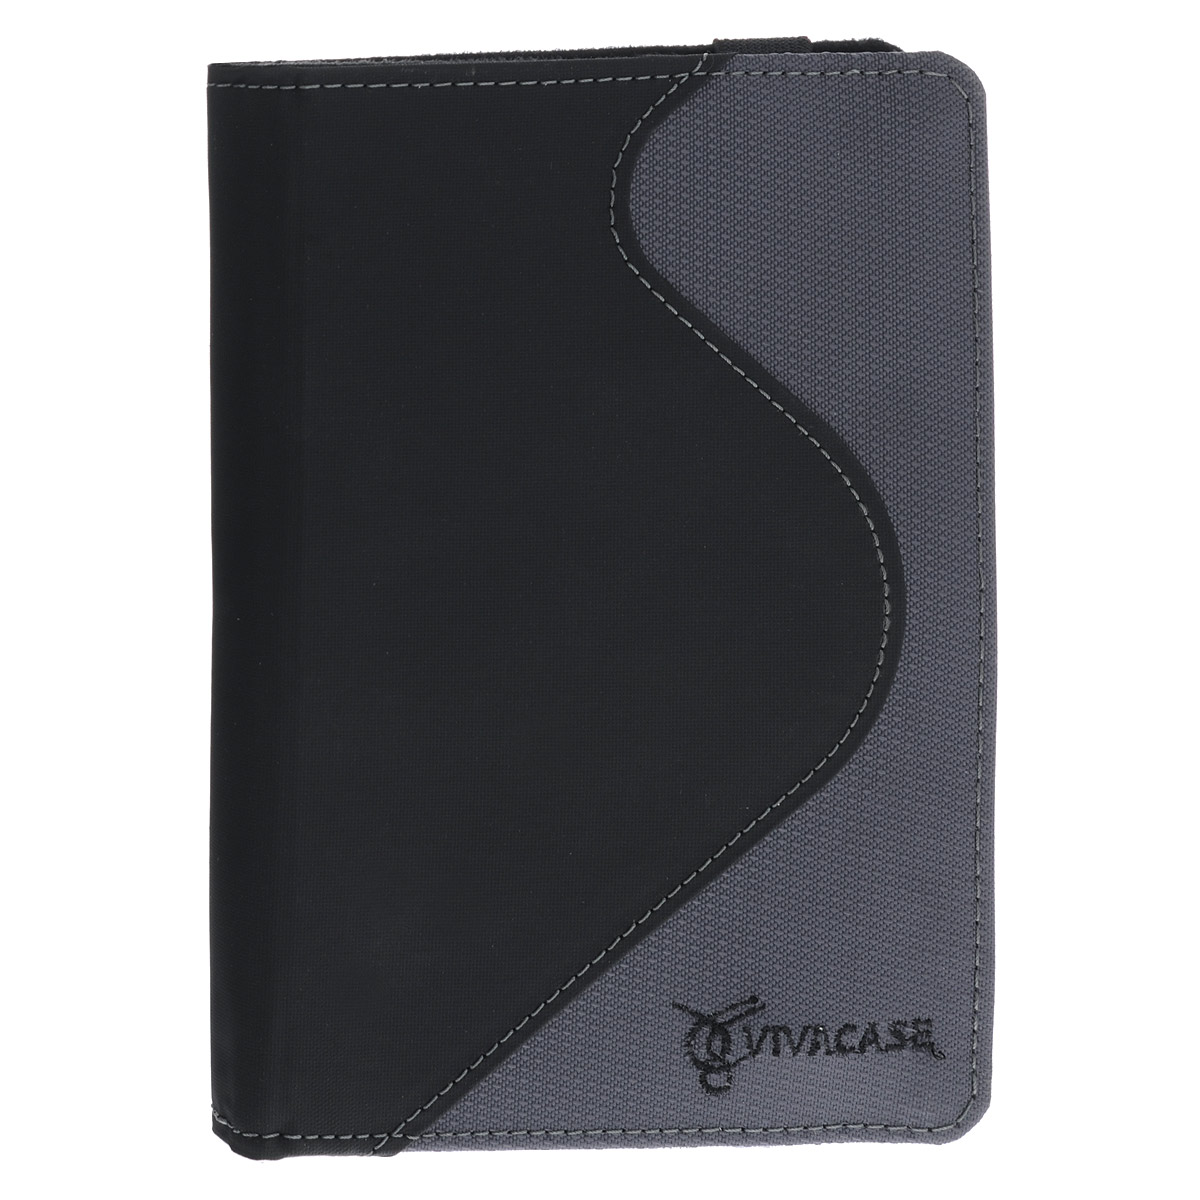 Vivacase S-style Lux обложка для PocketBook Touch 622, Black Grey